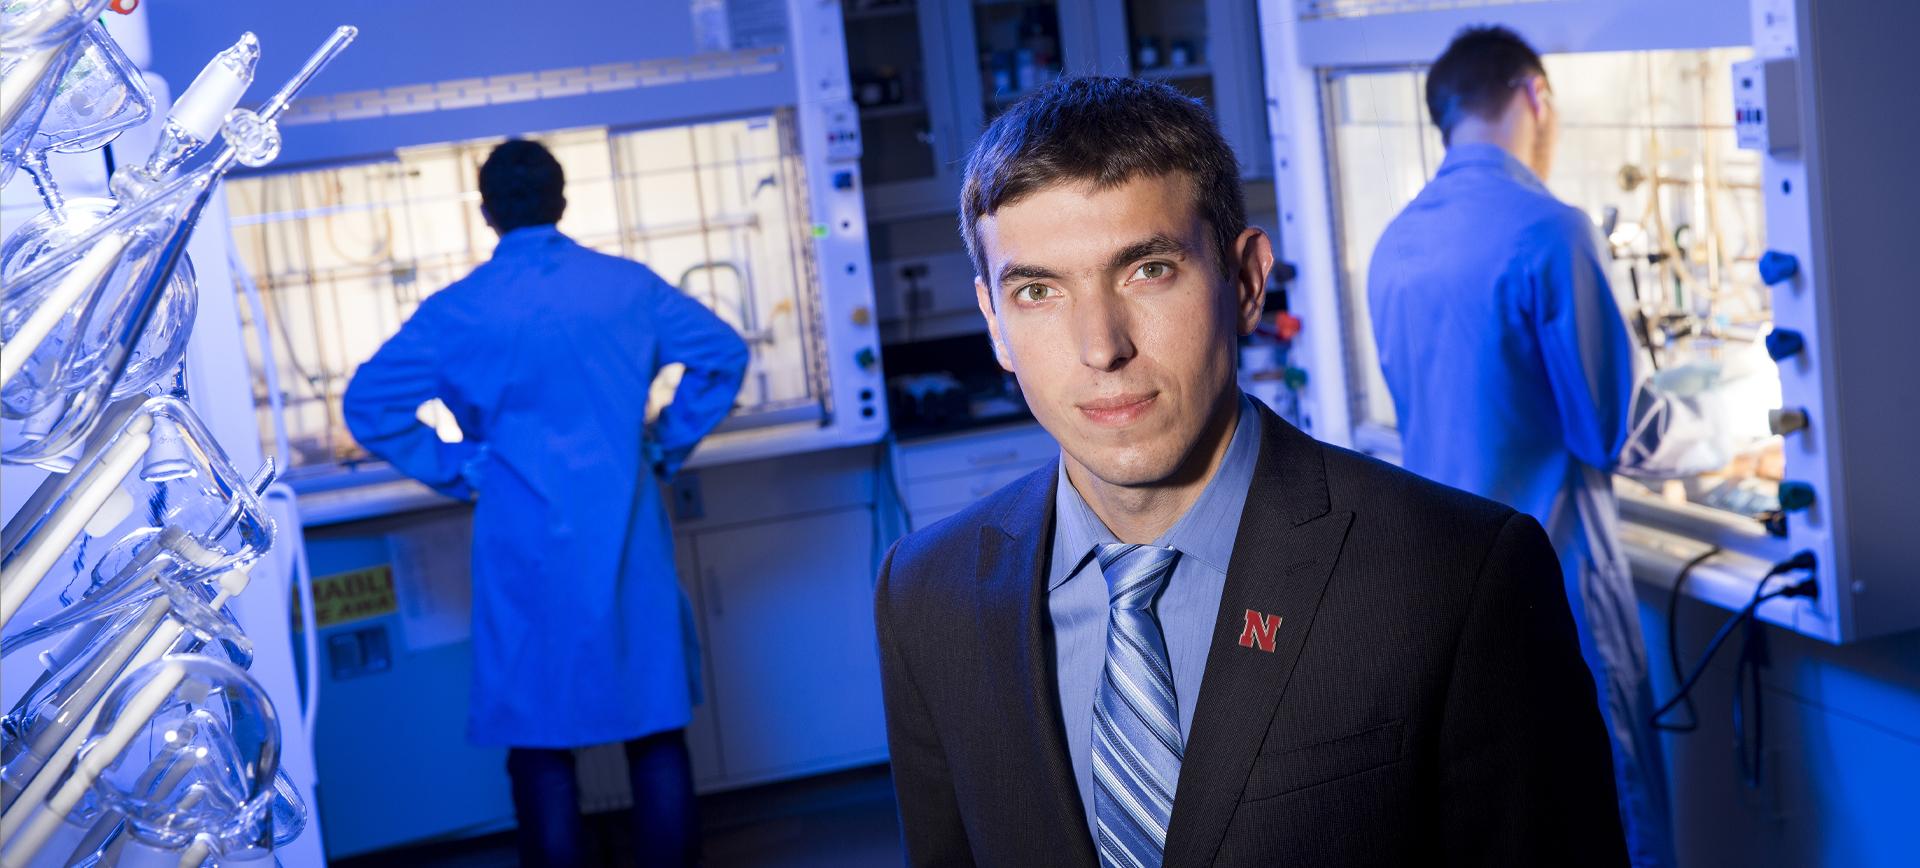 Professor Alexander Sinitskii in the lab